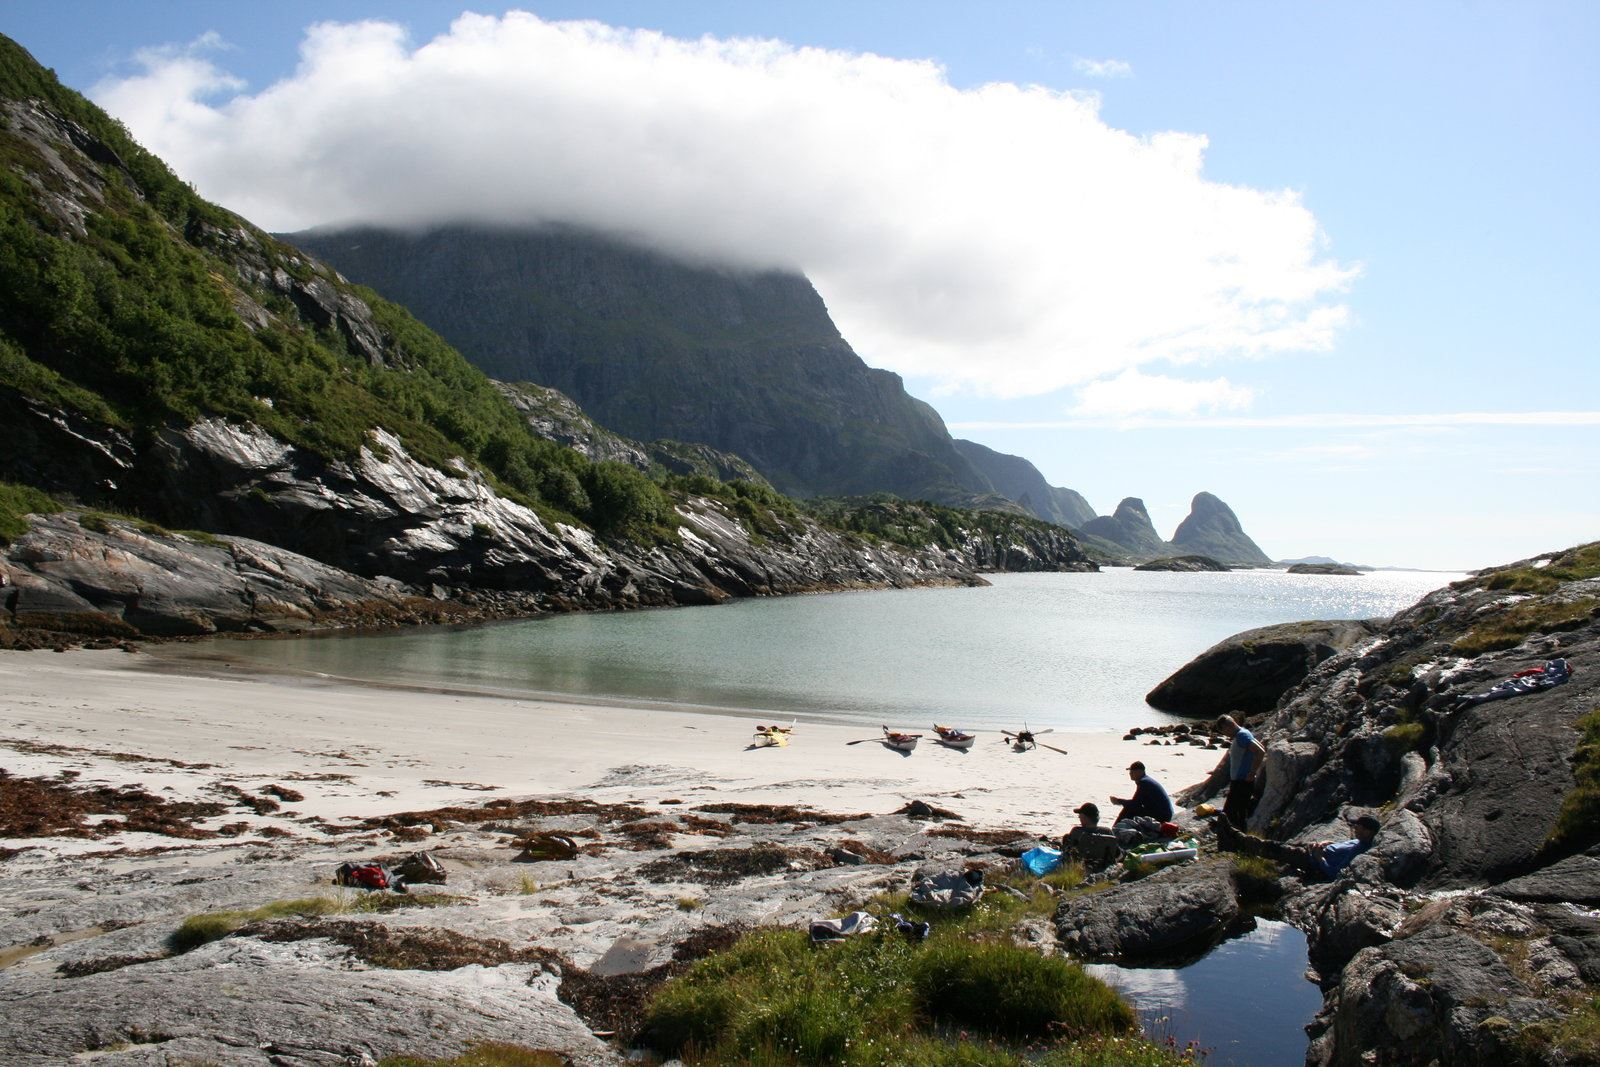 Helgeland Reiseliv,  © Helgeland Reiseliv, Hav og Fritid-sea kayaking